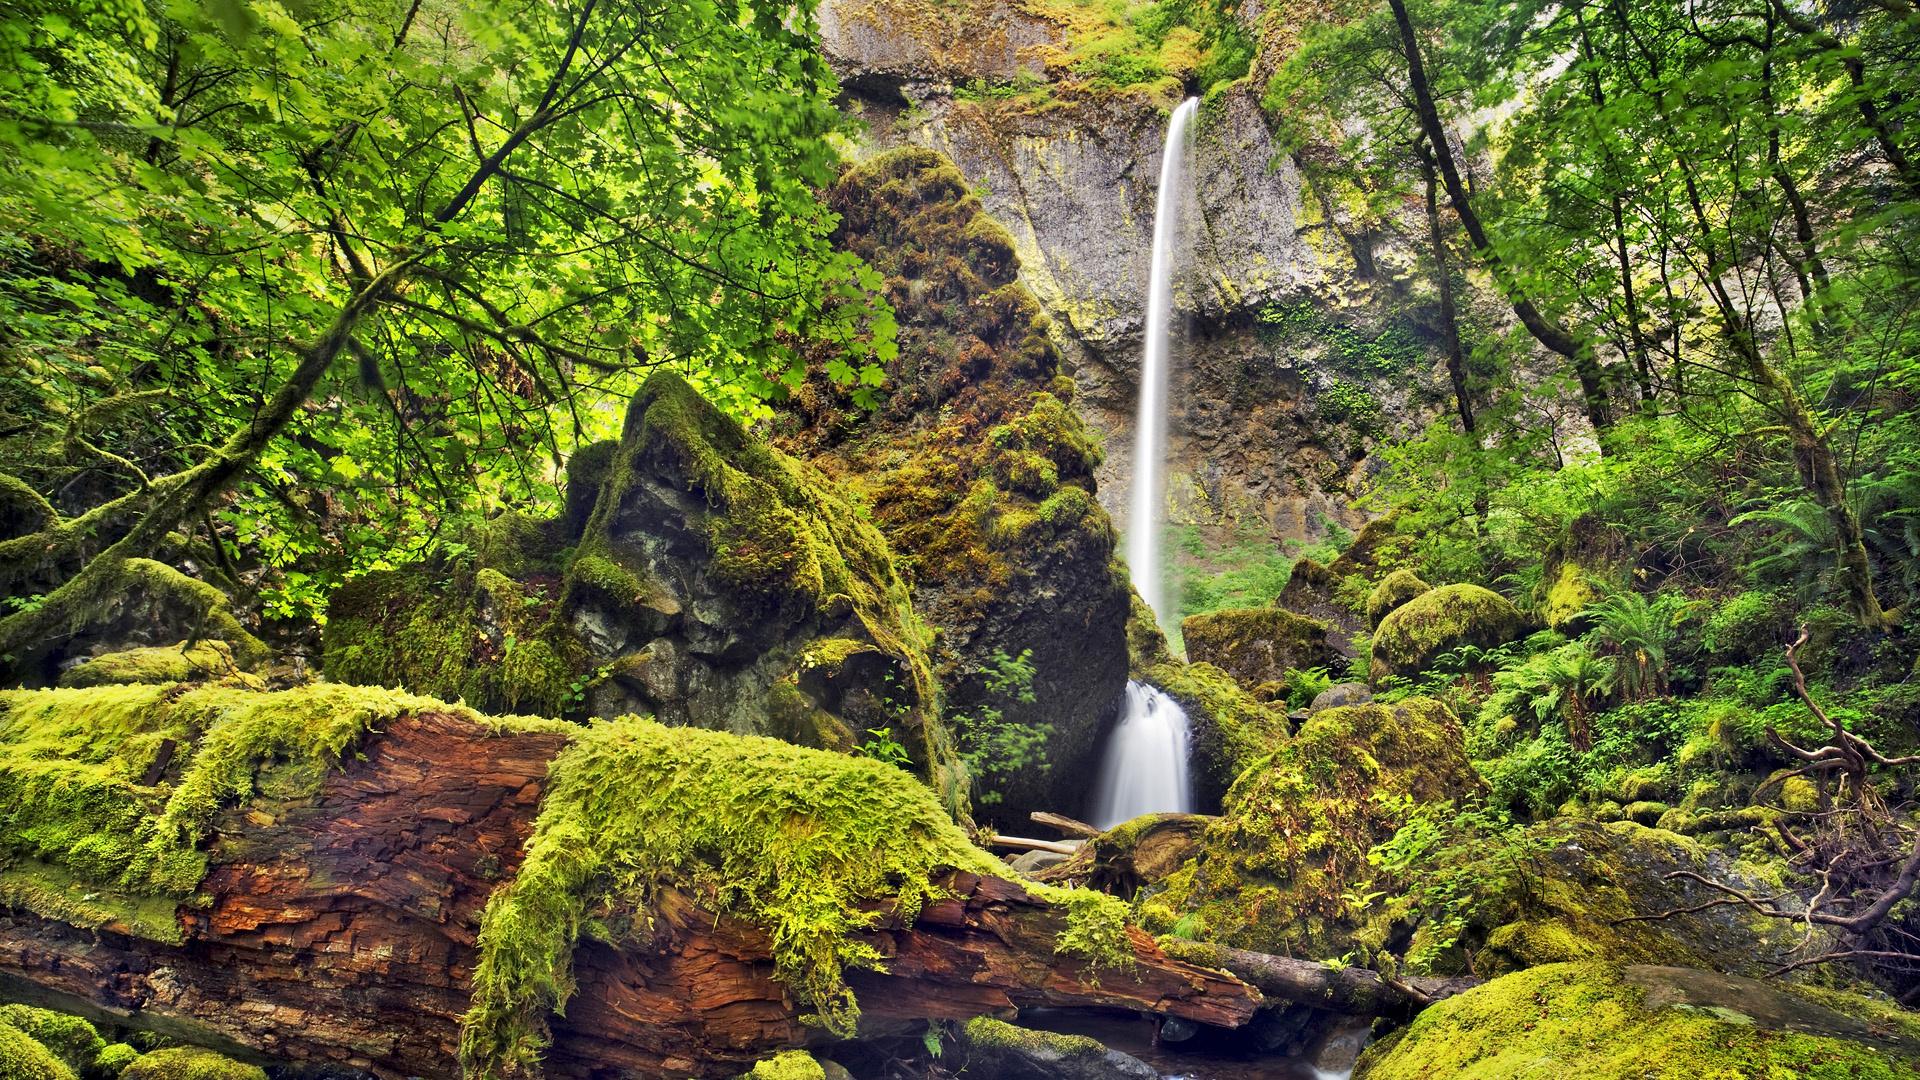 Elowah falls columbia river gorge oregon hd wallpaper - Waterfalls desktop wallpaper forest falls ...